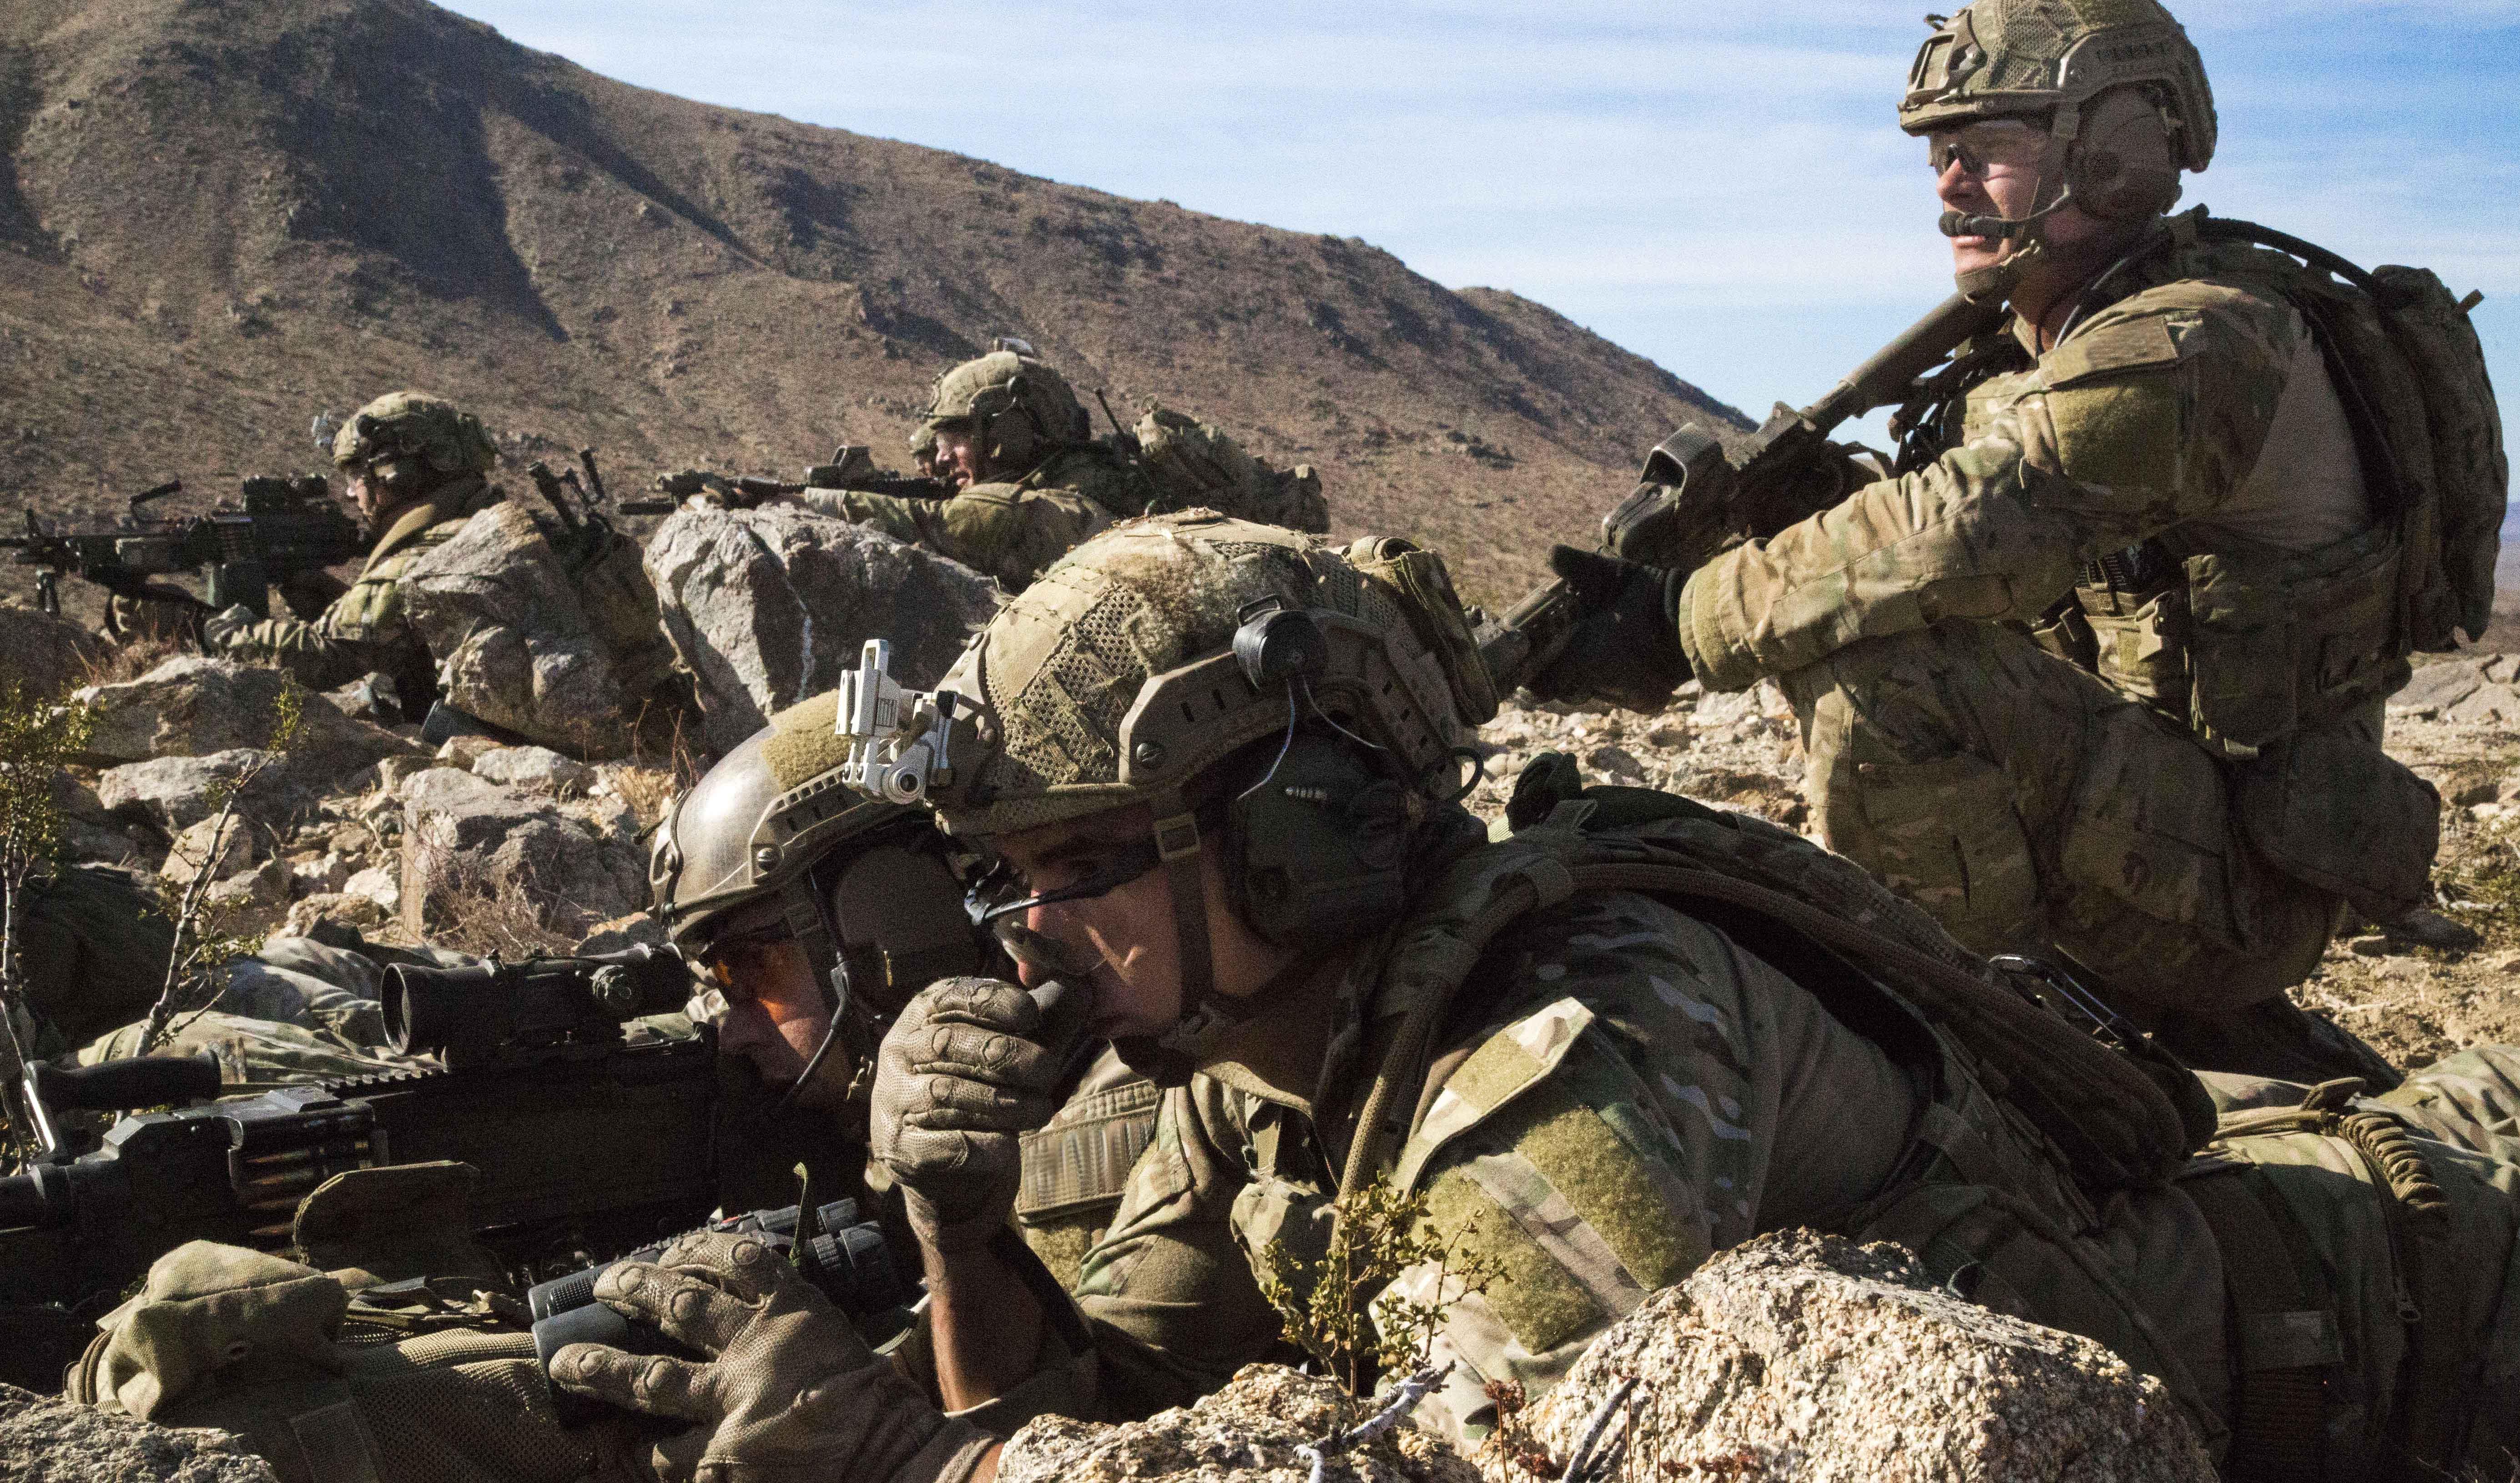 Army Of Us: U.S. DEPARTMENT OF DEFENSE > Photos > Photo Essays > Essay